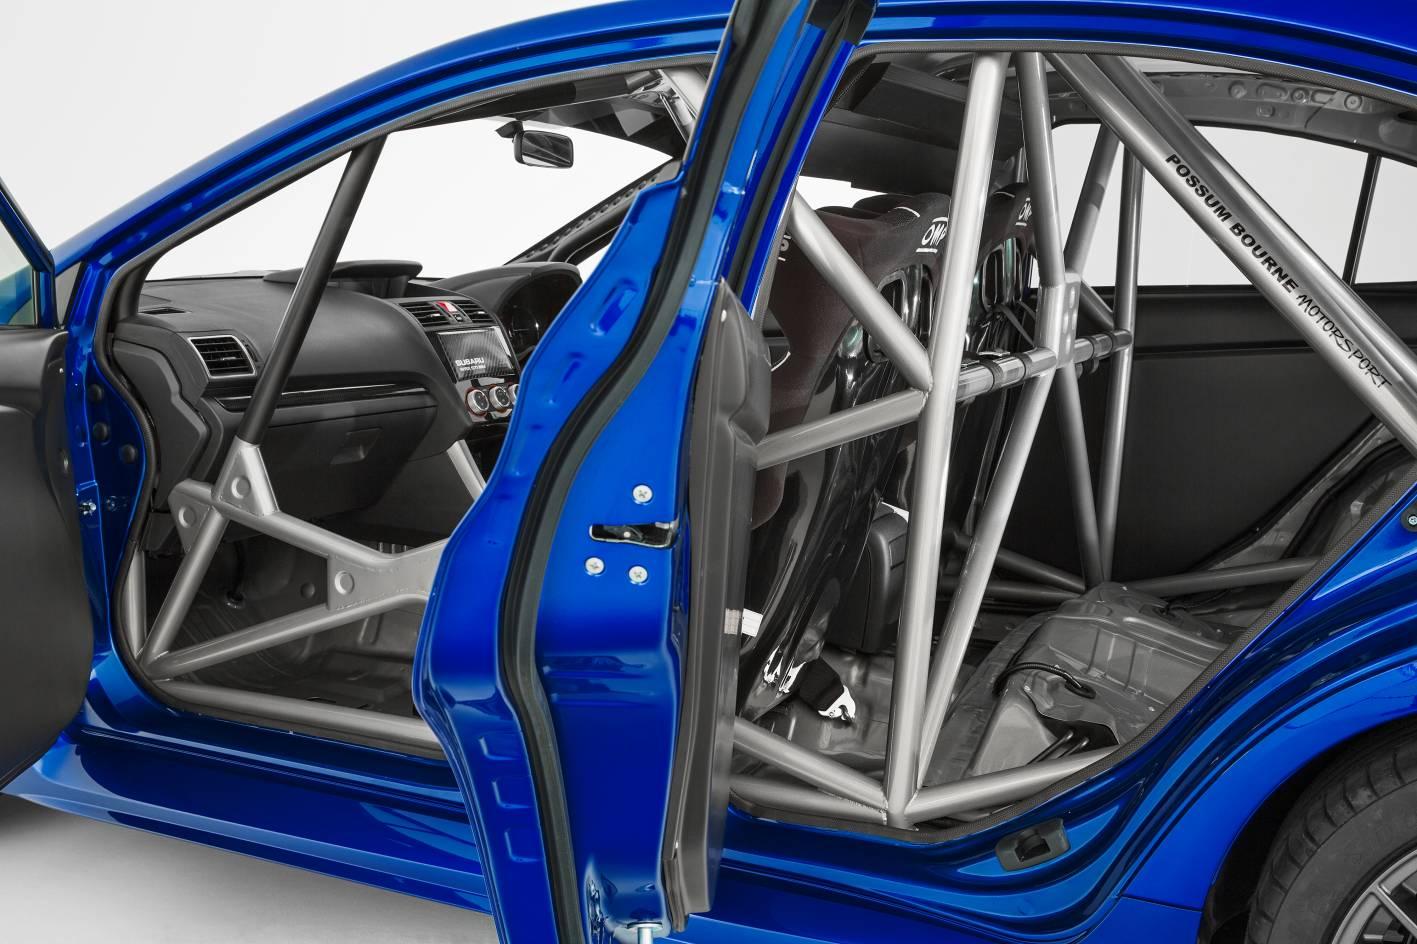 Toyota Of Alvin >> Subaru fires up motorsport-ready WRX STI NR4 - ForceGT.com